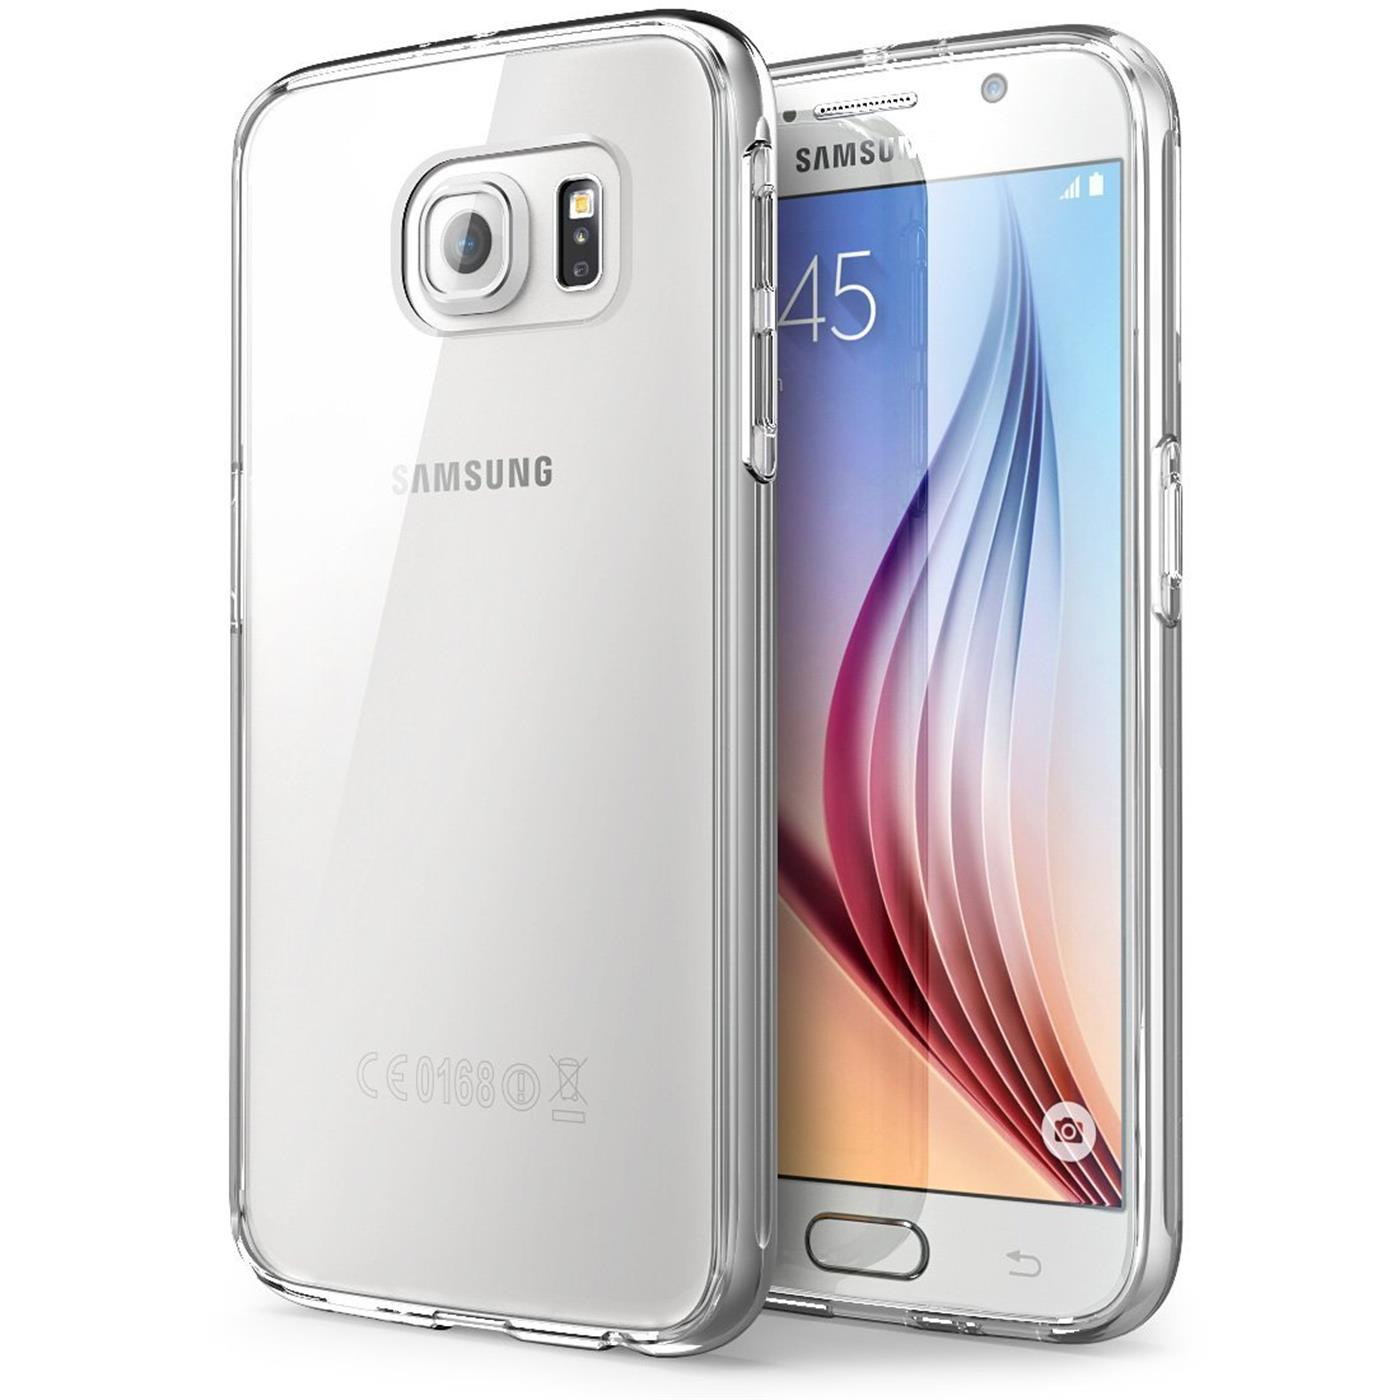 Samsung-Galaxy-s6-Edge-Plus-Thin-Silikon-Klar-Case-Cover-Ultra-Slim-Stossfeste Indexbild 4